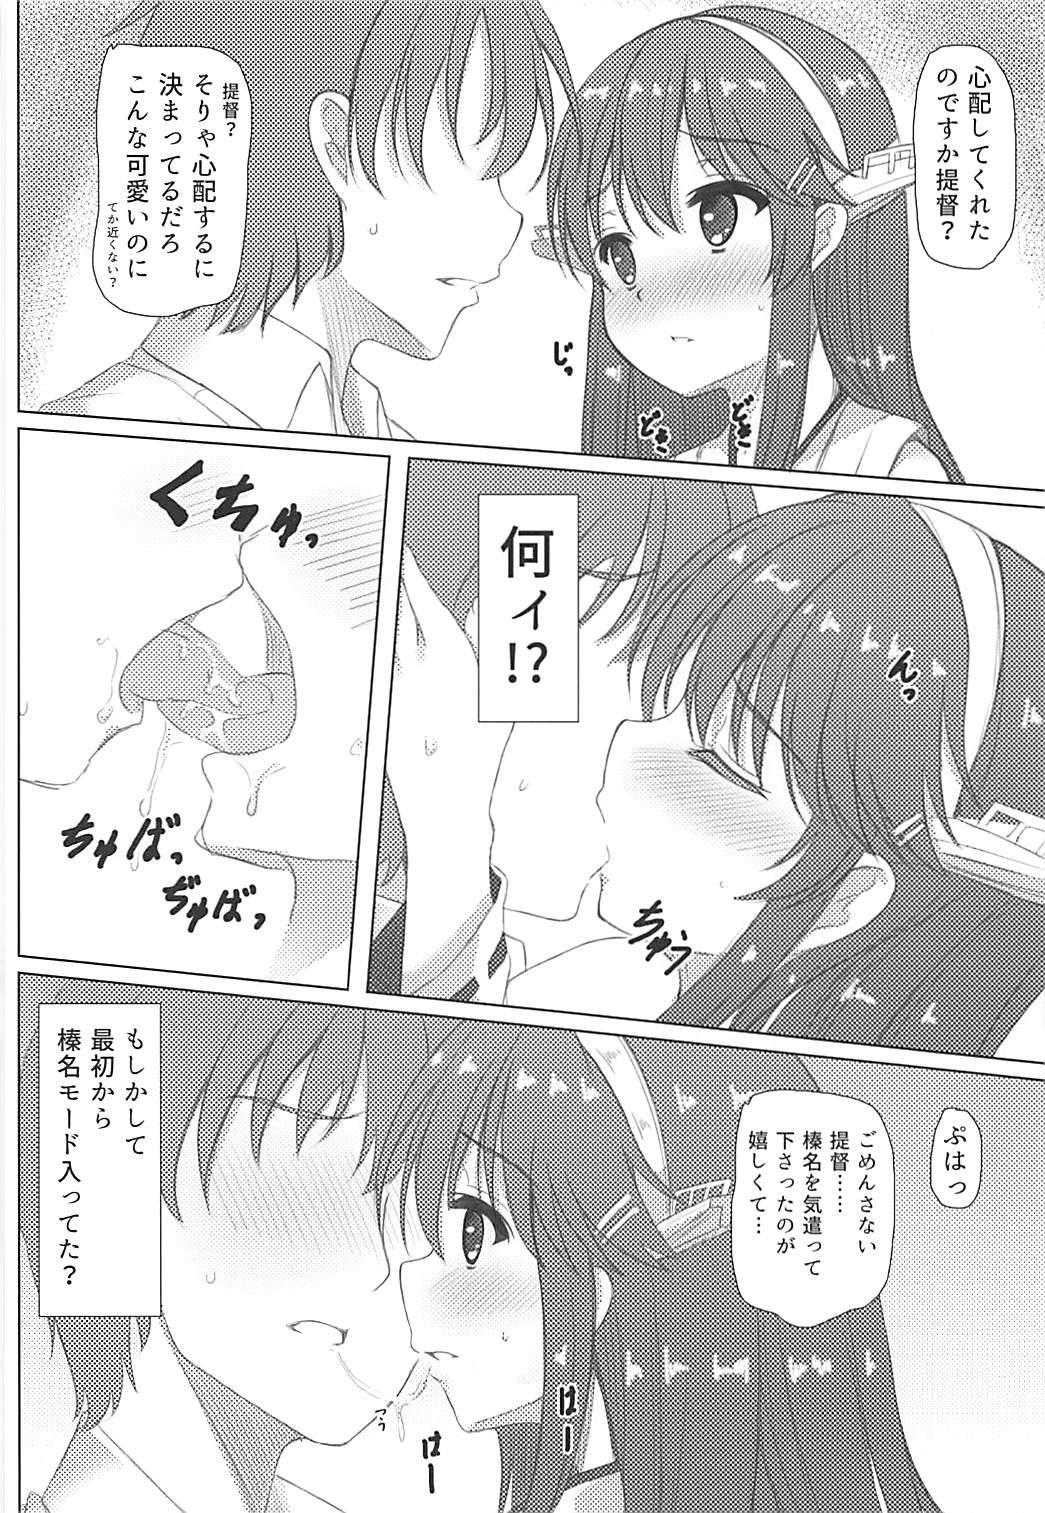 Haruna-kun Celebration 18